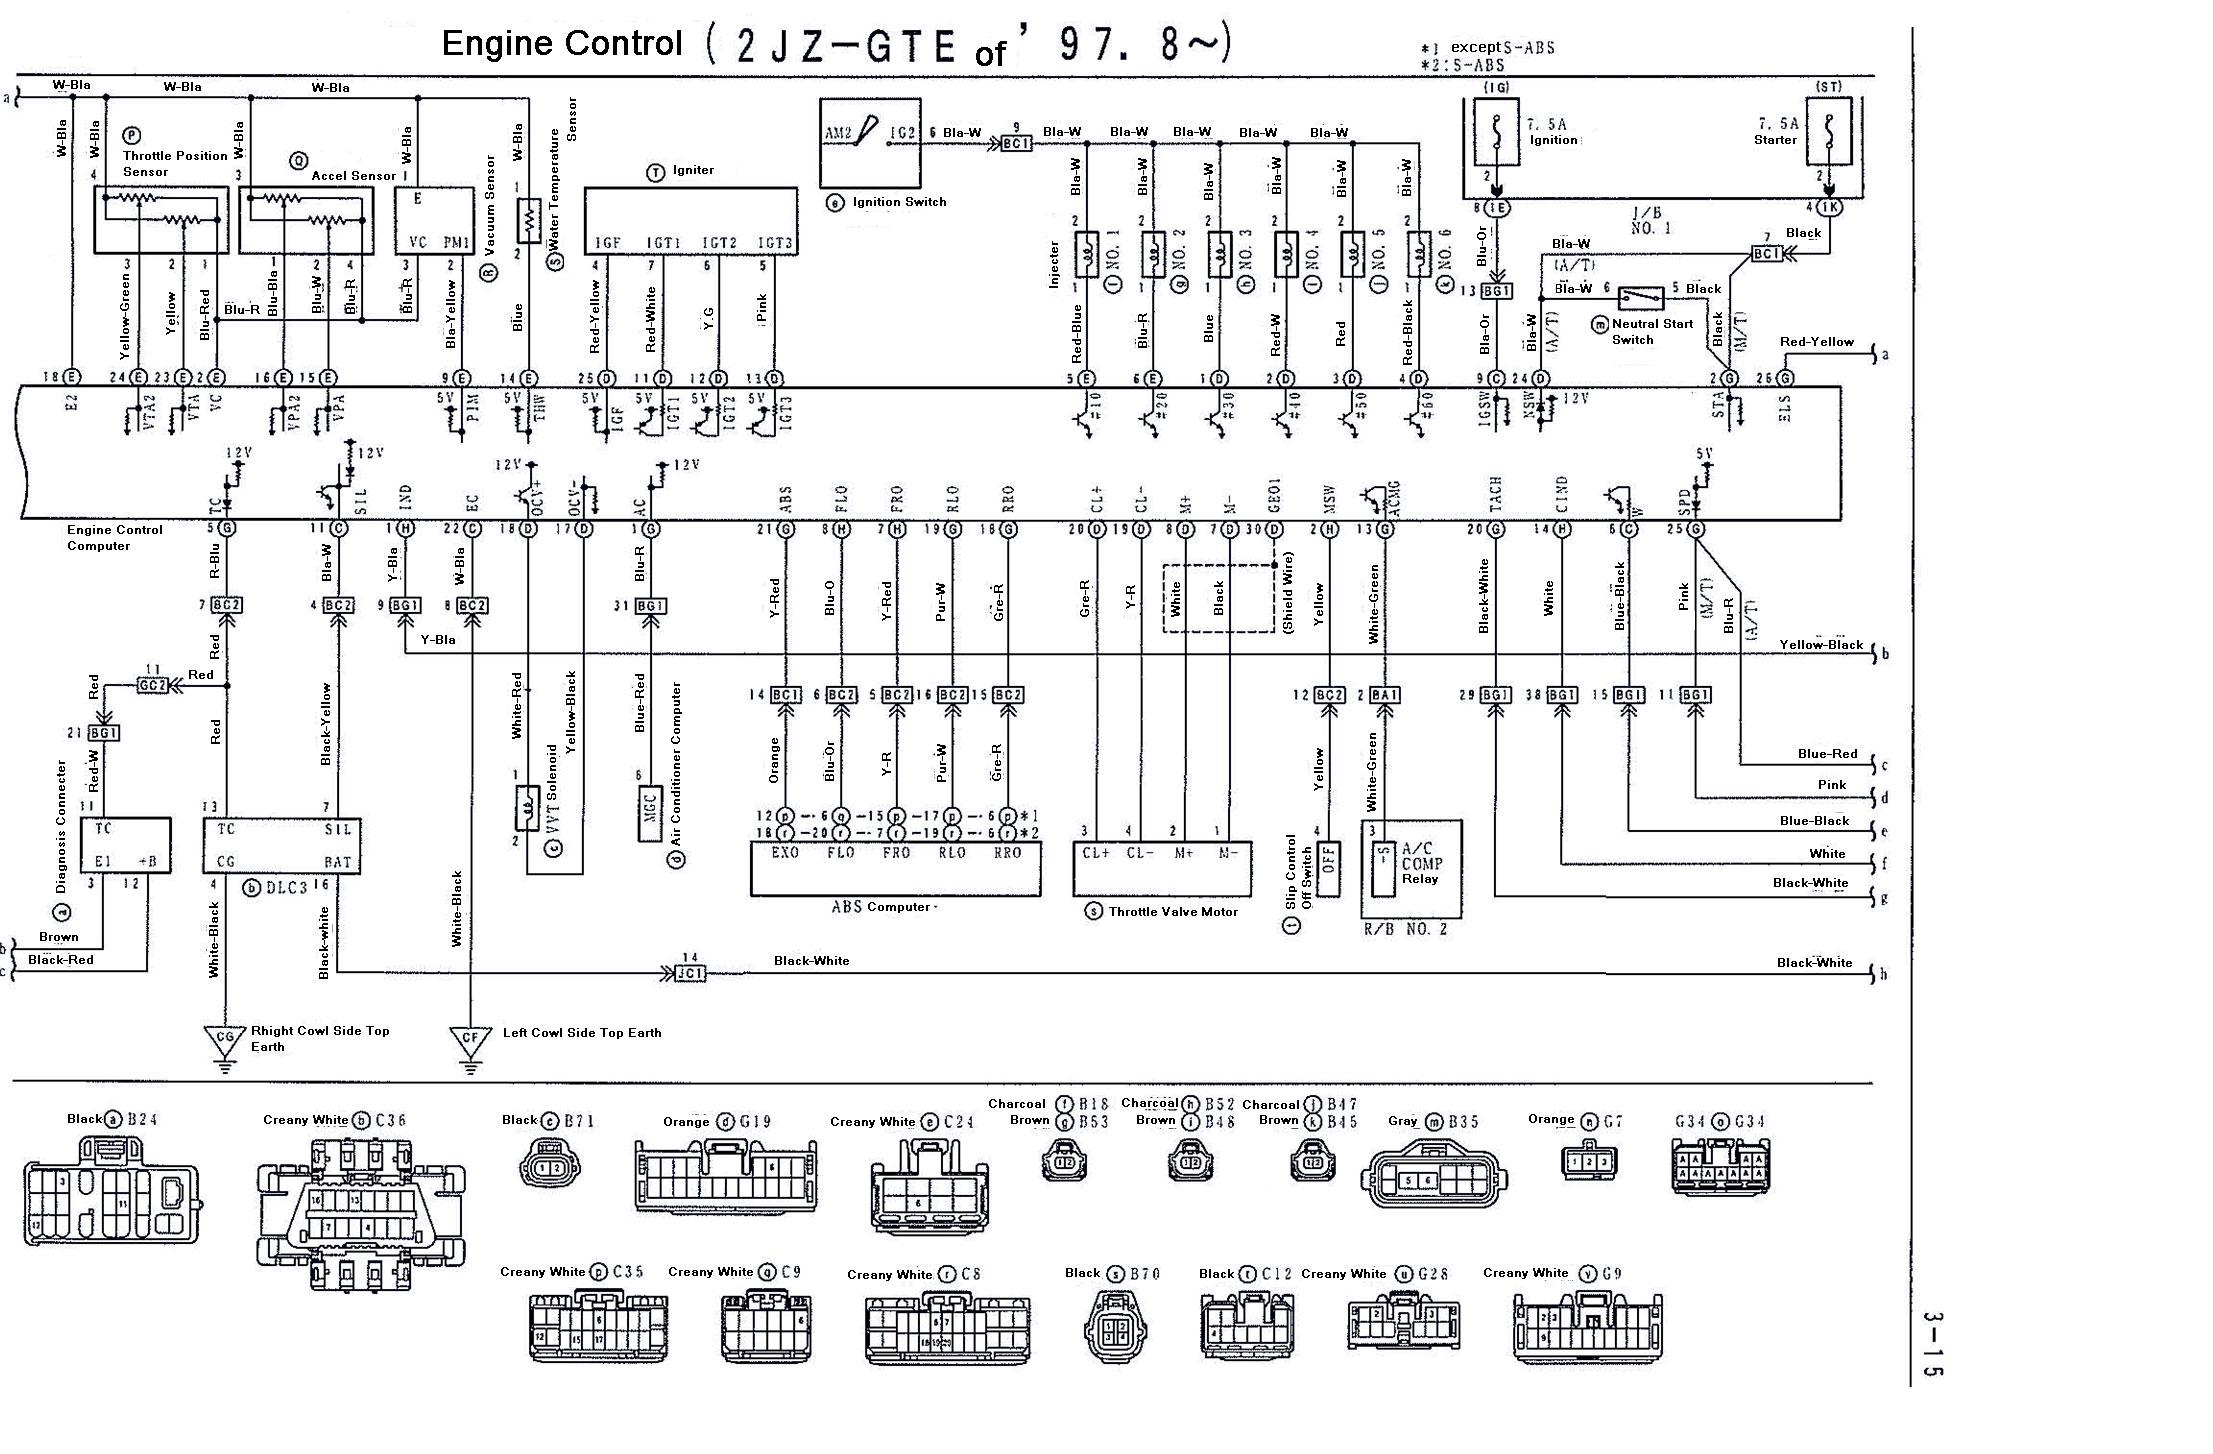 2jz Ge Vvti Wiring Diagram